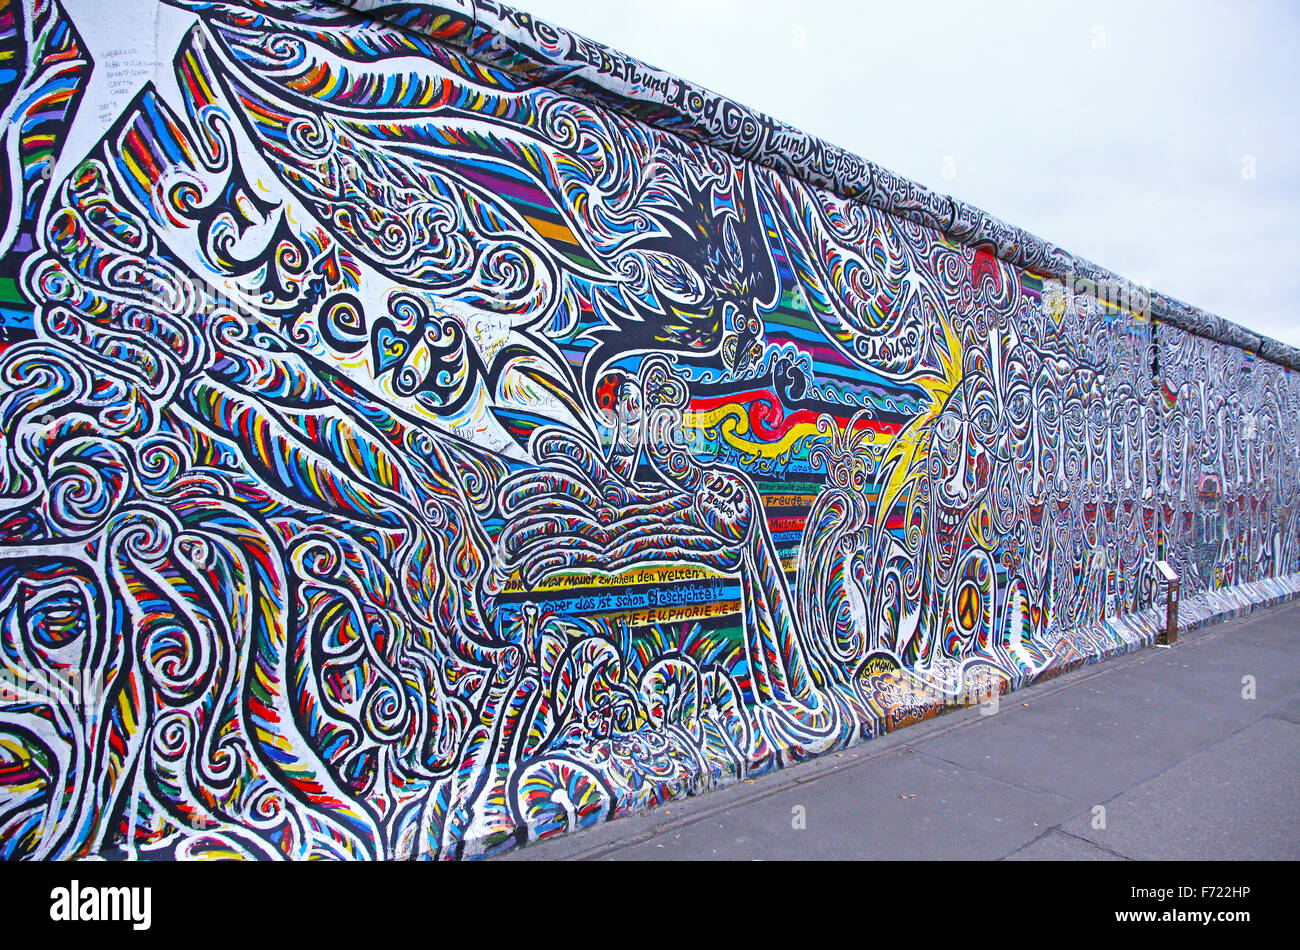 BERLIN - 10 NOVEMBRE 2013: Fragment d'East Side Gallery le 10 novembre 2013 à Berlin, Allemagne. Photo Stock